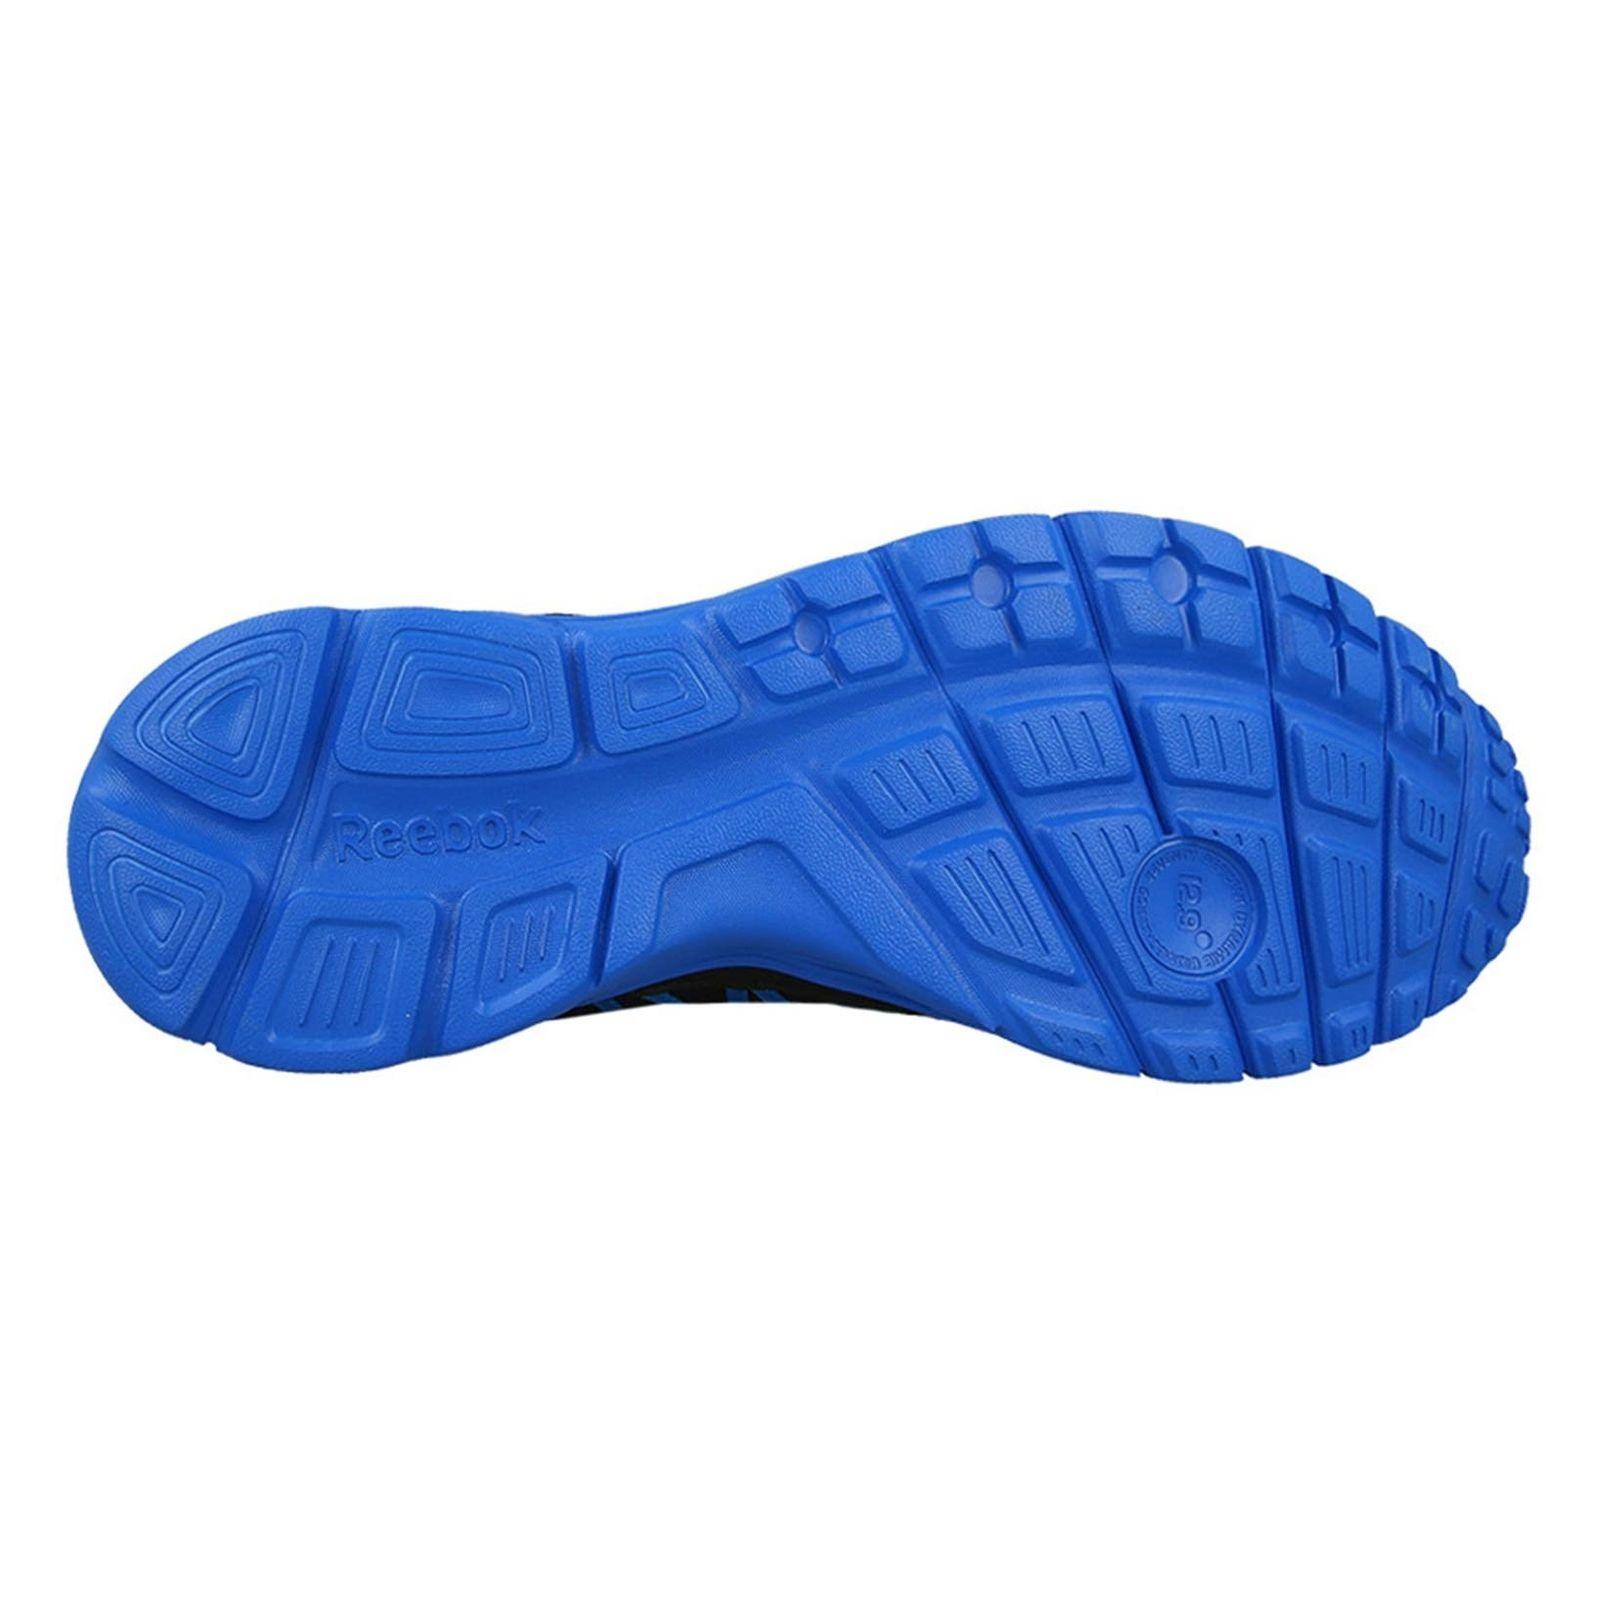 کفش دویدن بندی مردانه Speedlux 2-0 - ریباک - مشکي آبي - 2